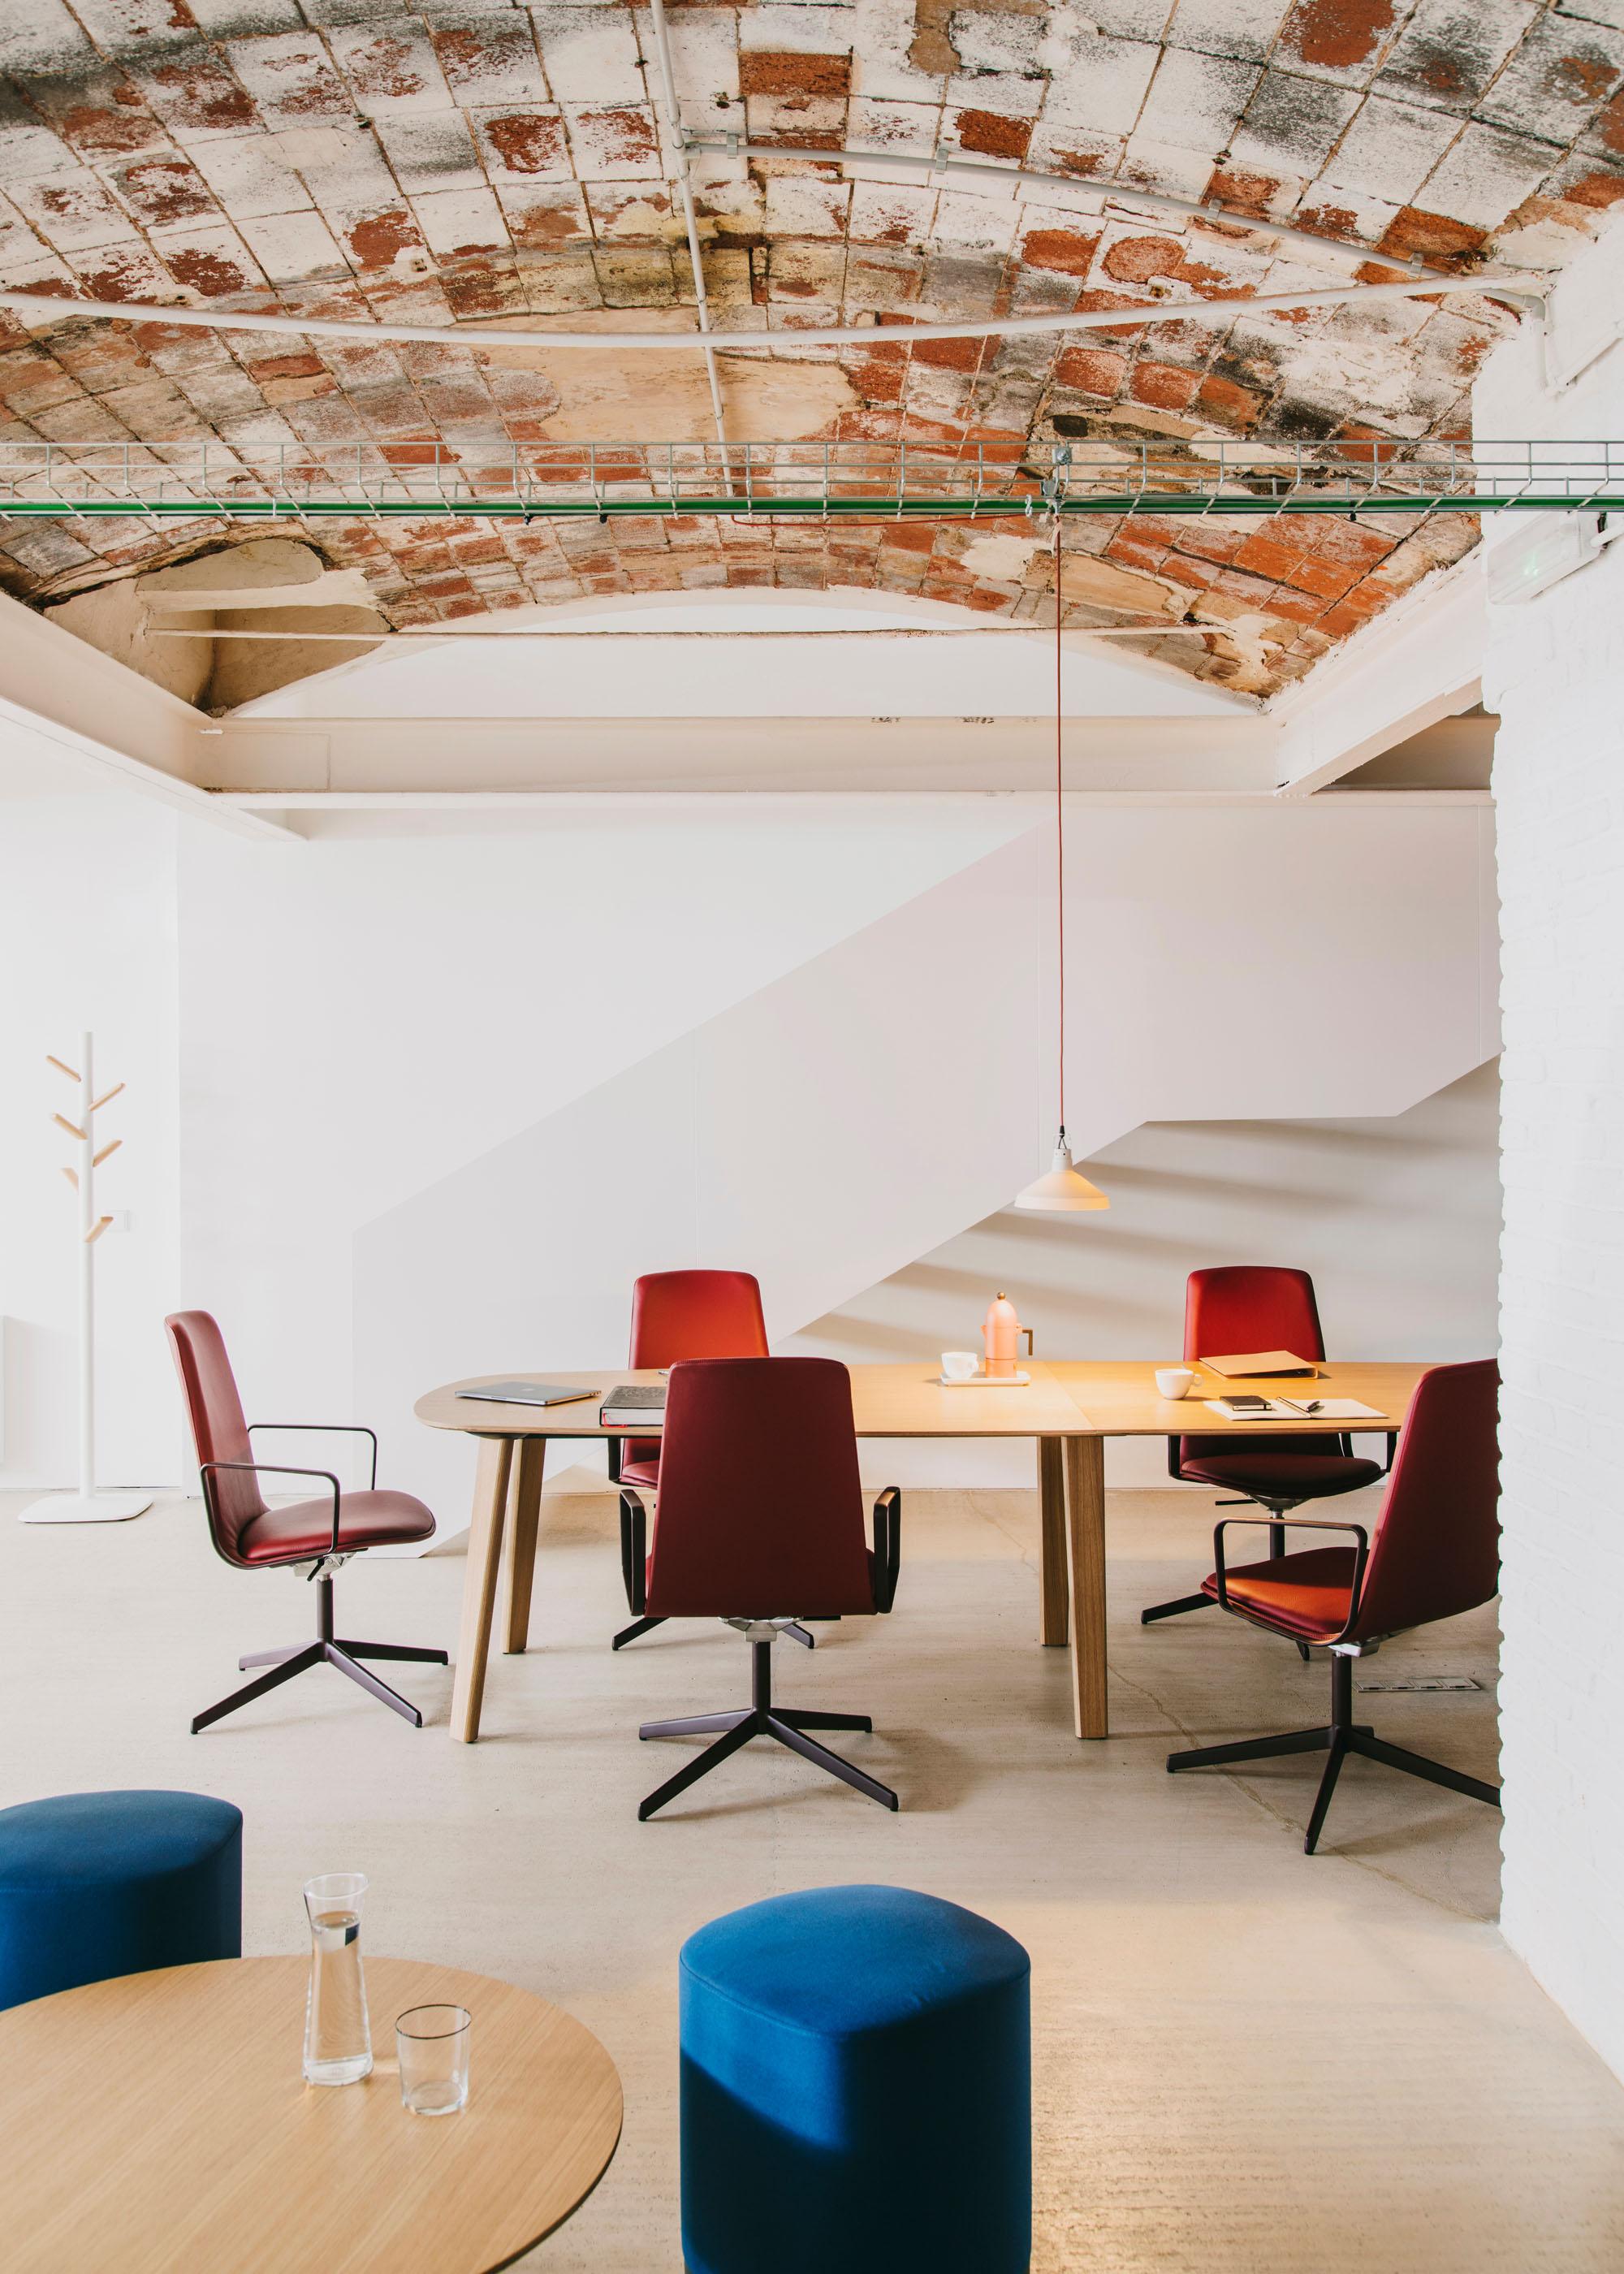 #furniture #enea #design #clase #basque #chairs #interiors #montoya #workspace